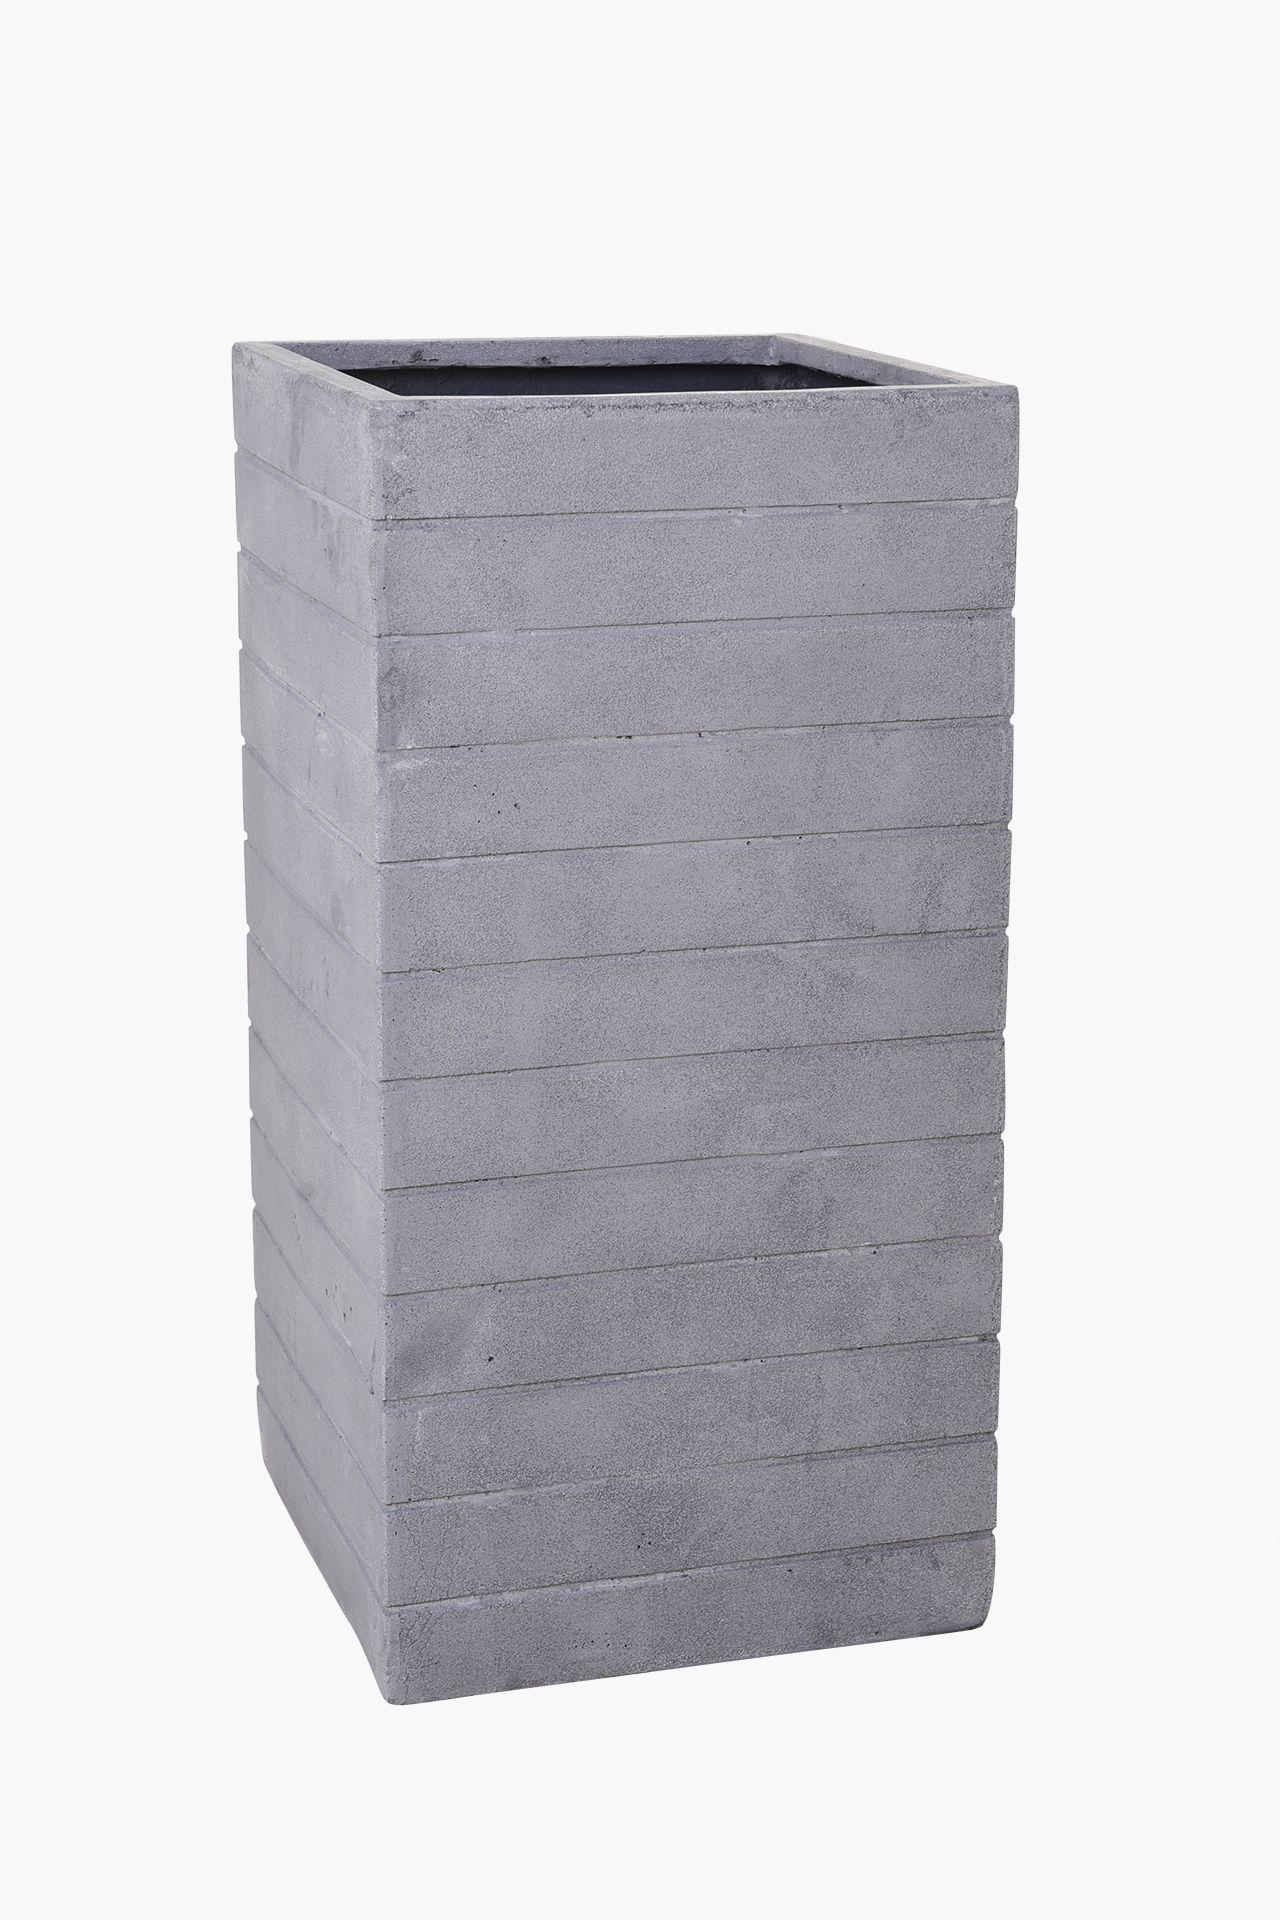 pflanzk bel blumenk bel fiberglas mit rillen block 80 cm sandstein grau ebay. Black Bedroom Furniture Sets. Home Design Ideas